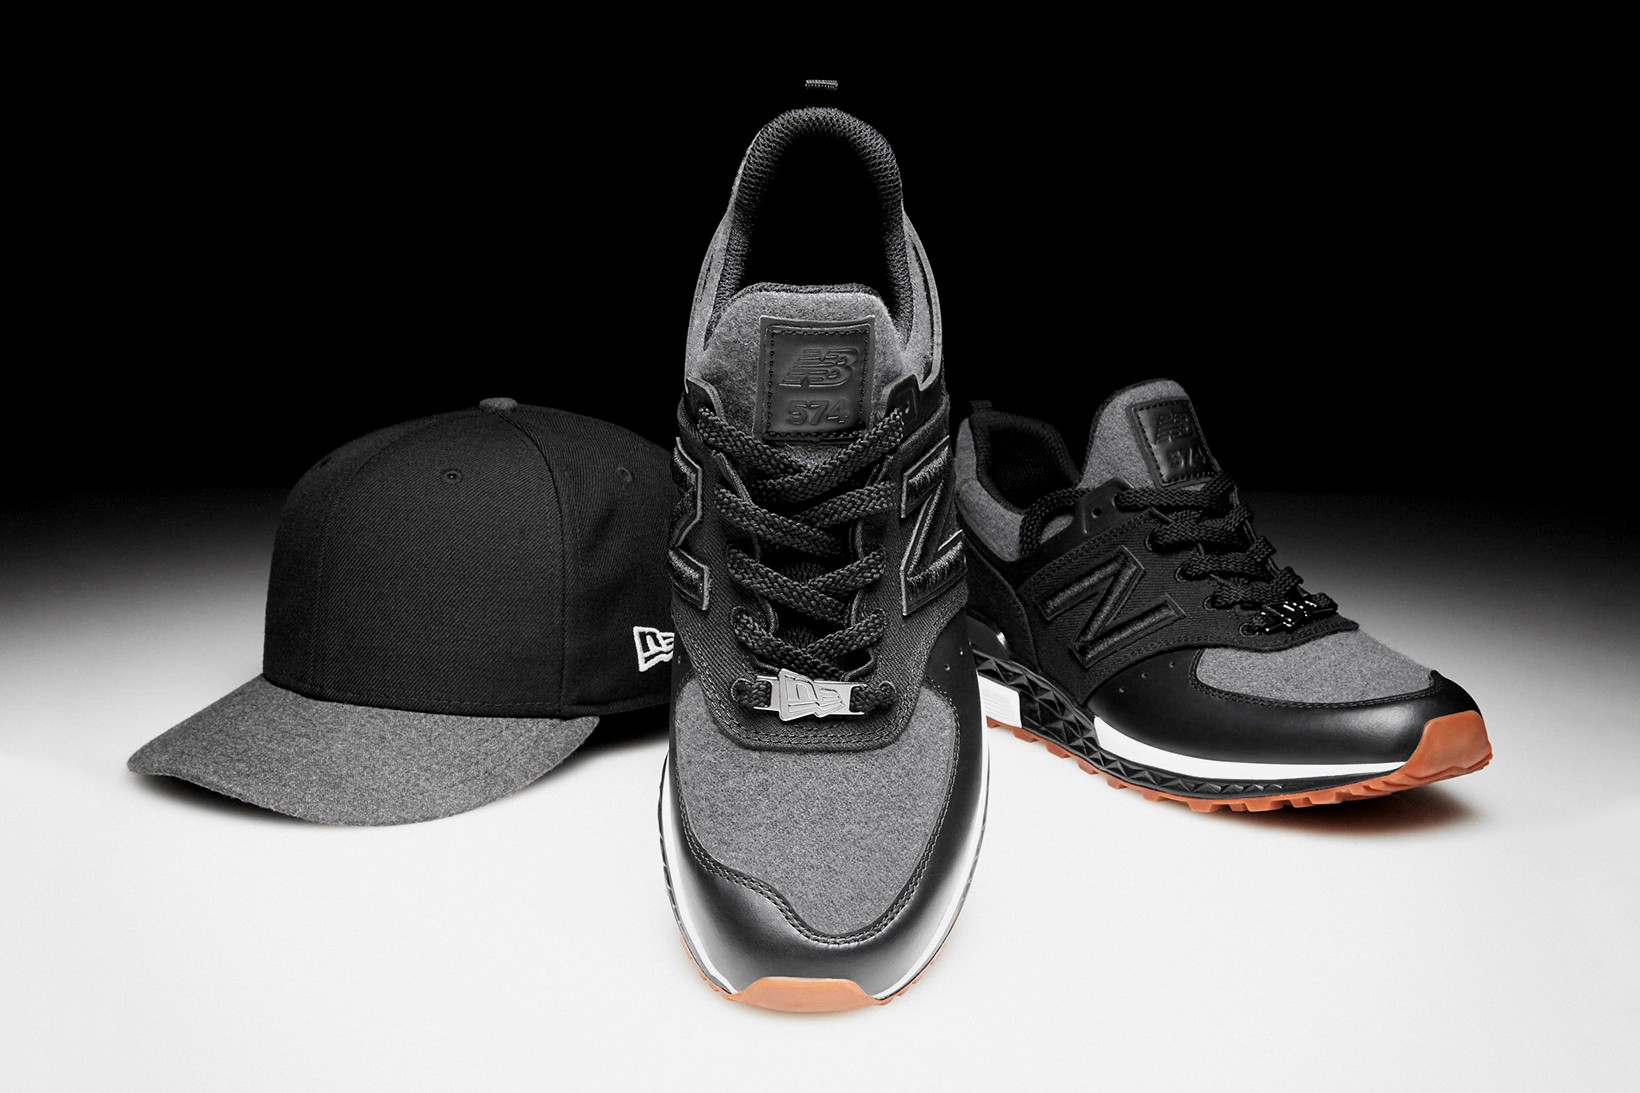 New Era x New Balance 574 Sport Capsule